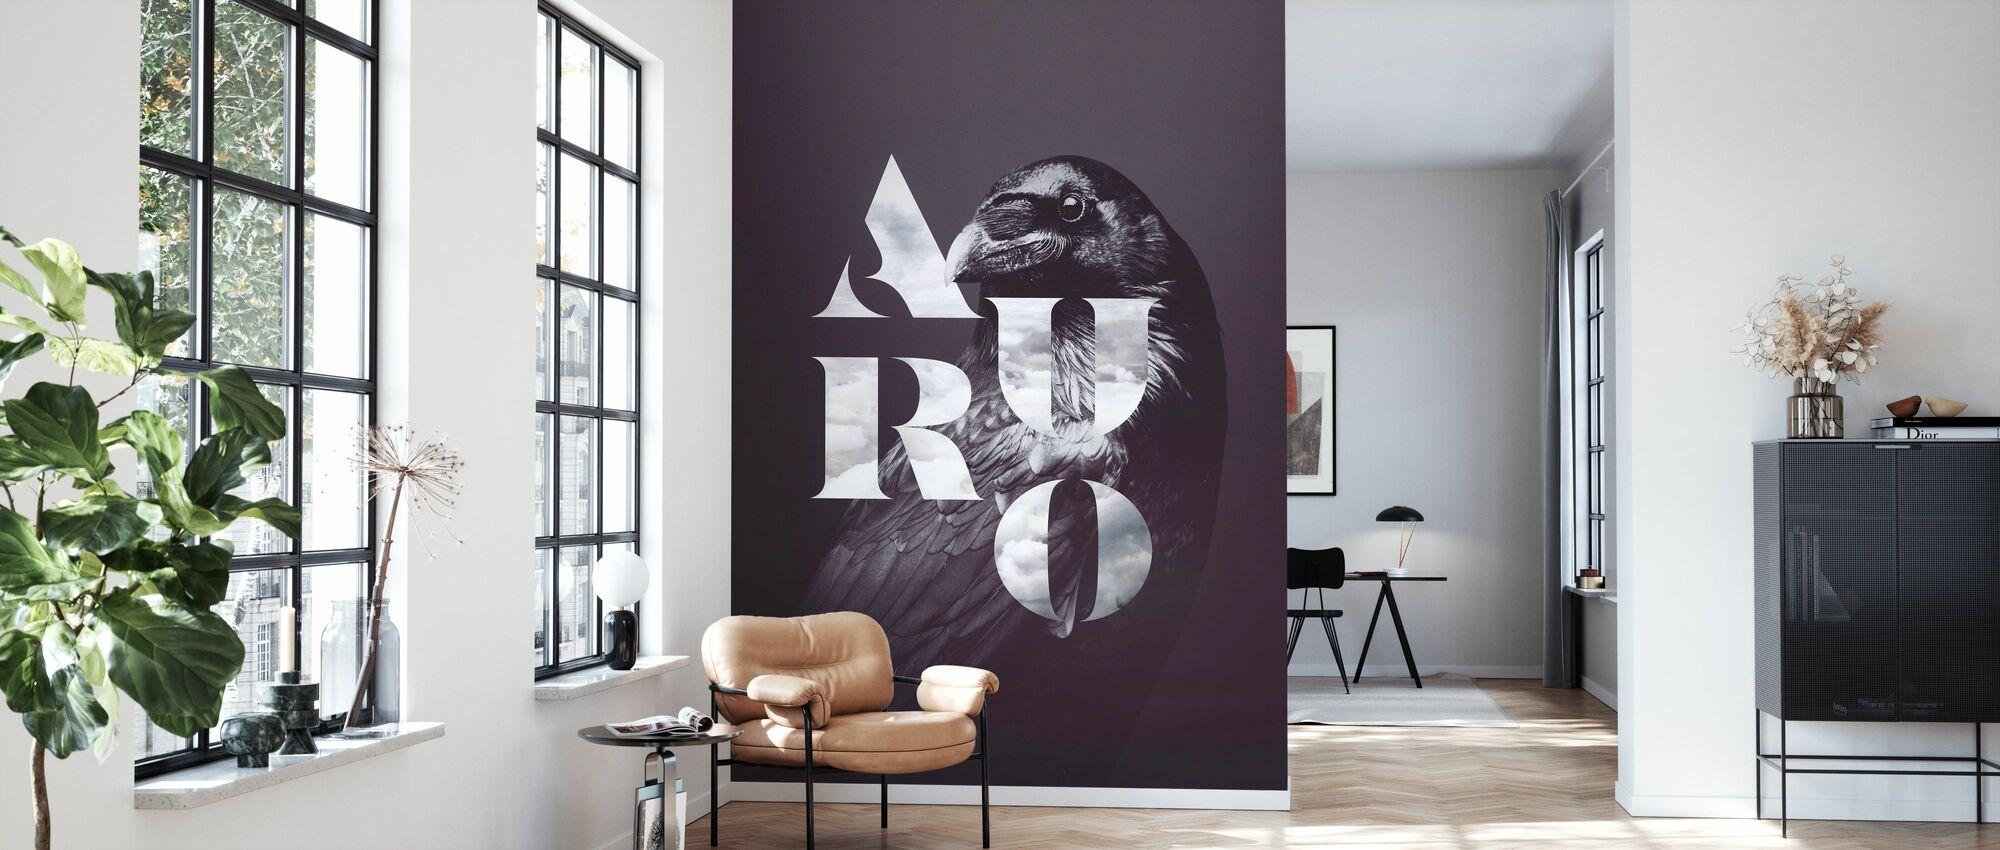 Auro - Wallpaper - Living Room